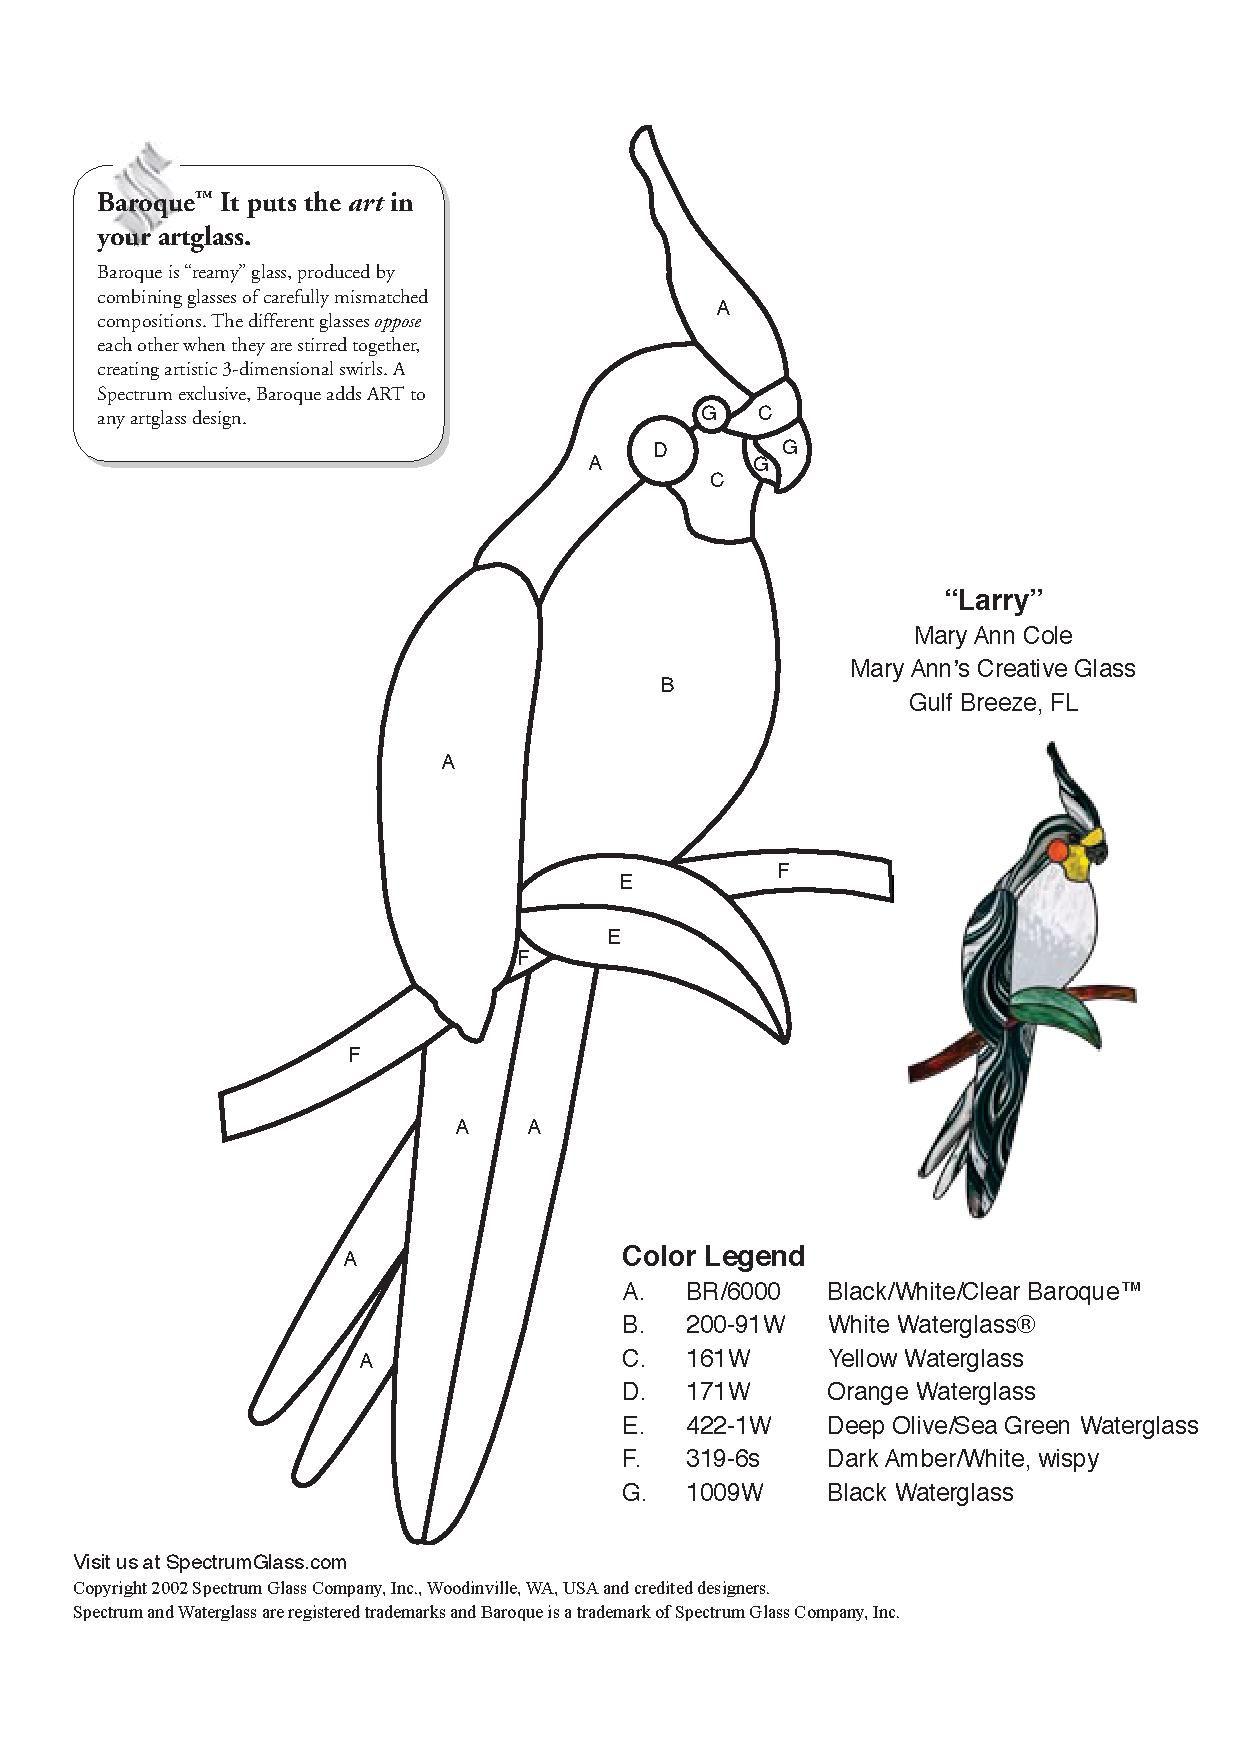 Patron Pour Vitrail Perroquet Vitrail Tiffany Glas In Lood Vogels Vogel Sjabloon Patronen